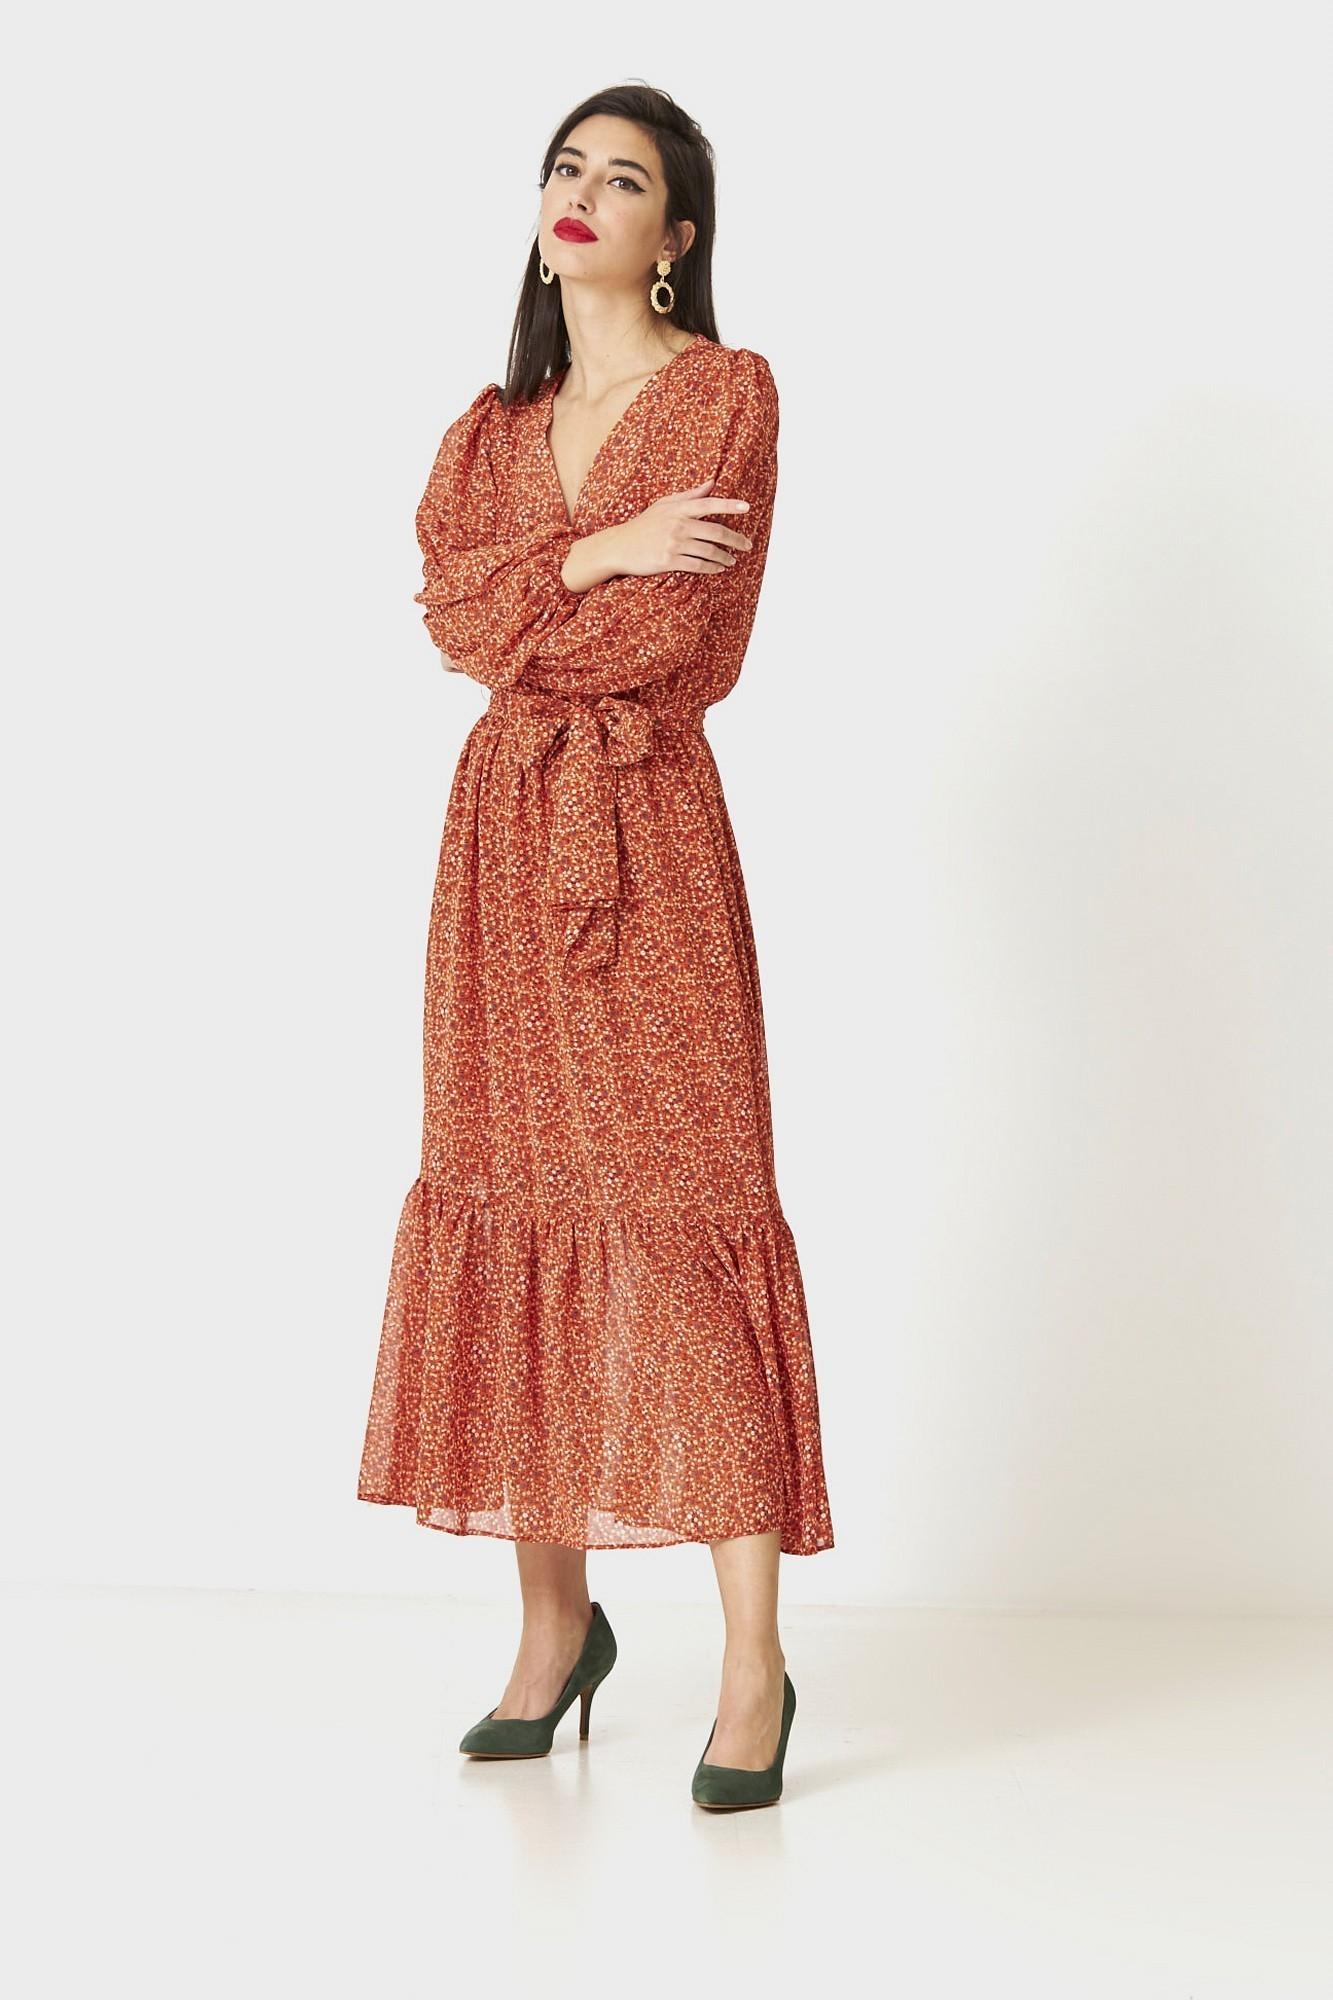 SISTER DAEL DRESS